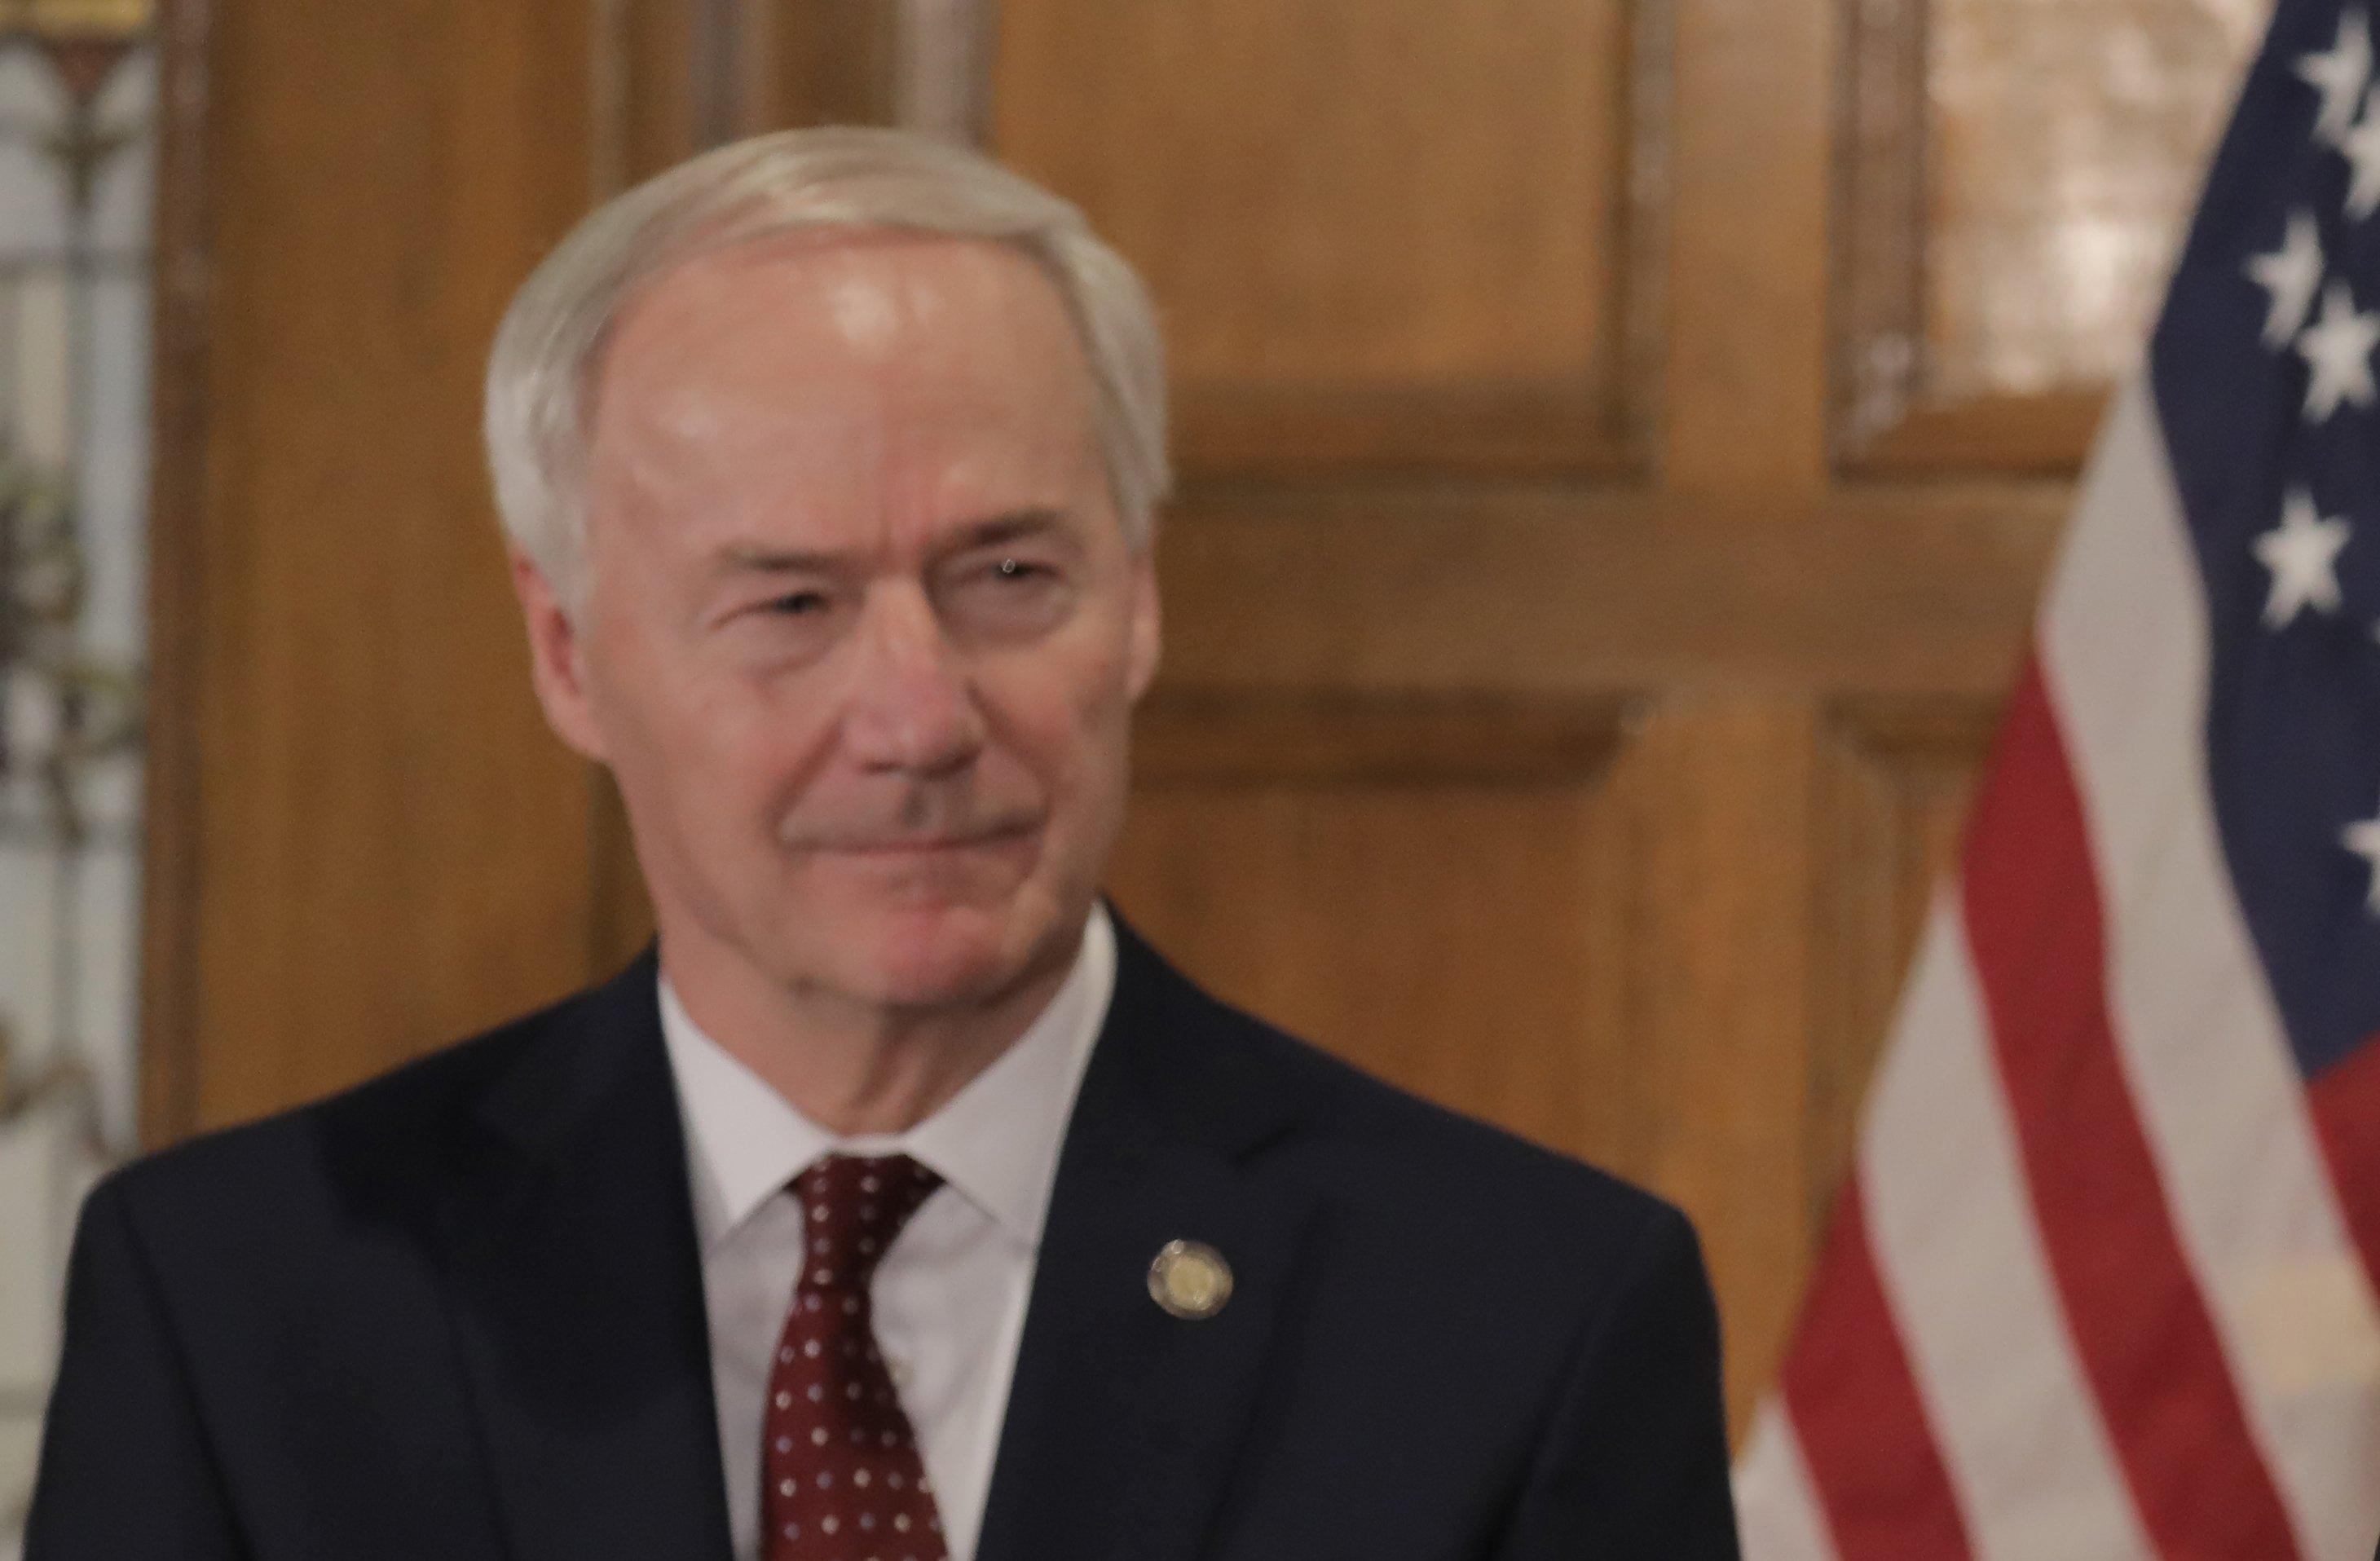 Legislators back 3 state officials' pay raises